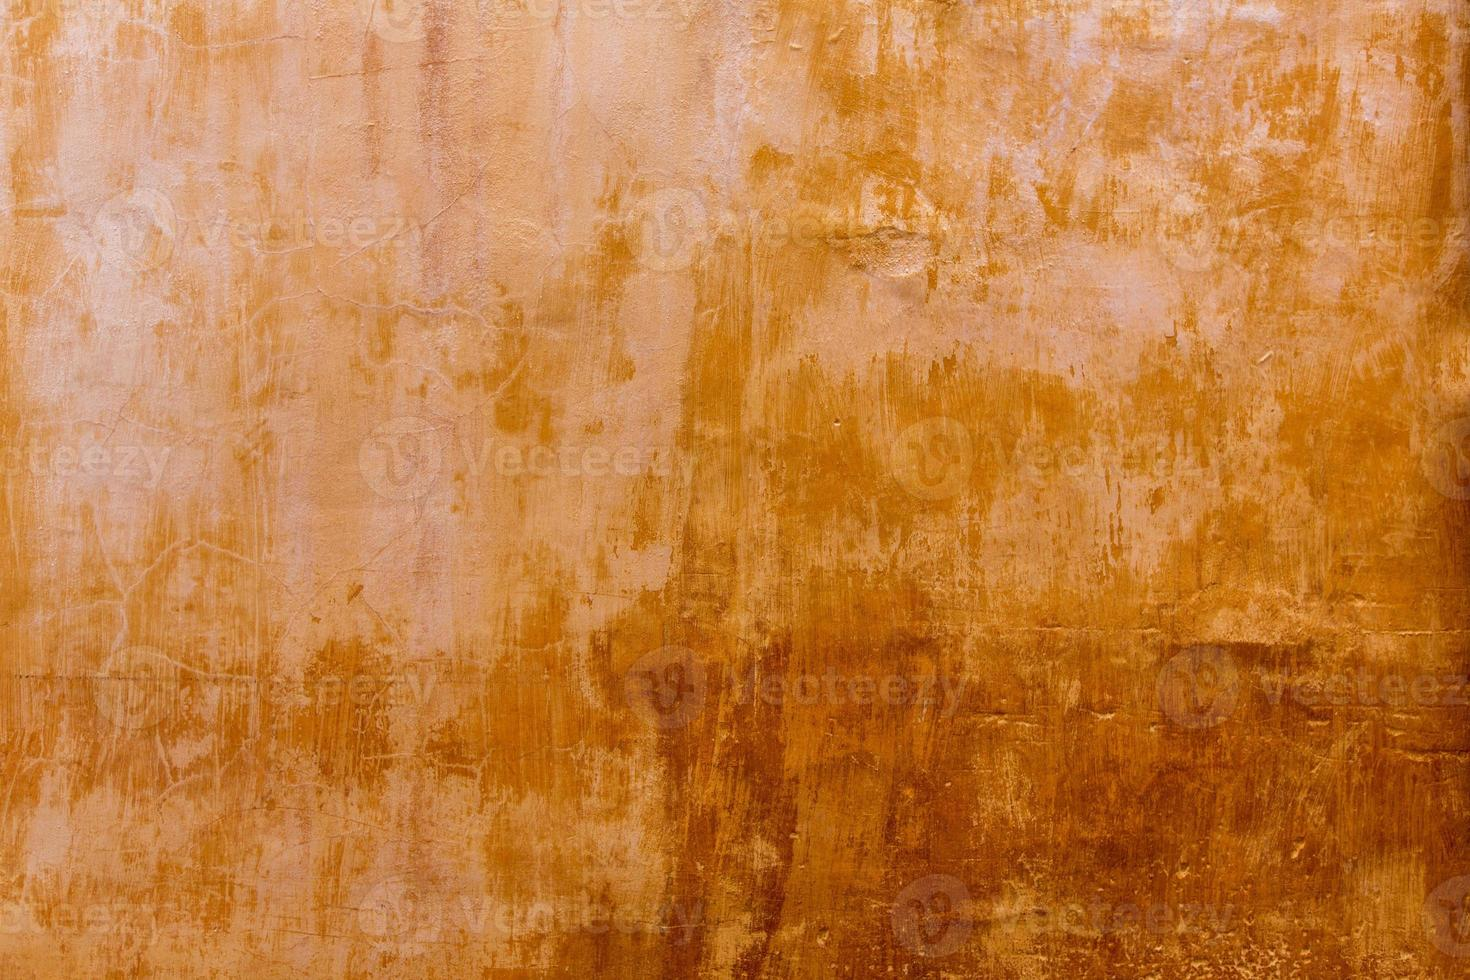 Minorque ciutadella texture de façade ocre grunge doré photo